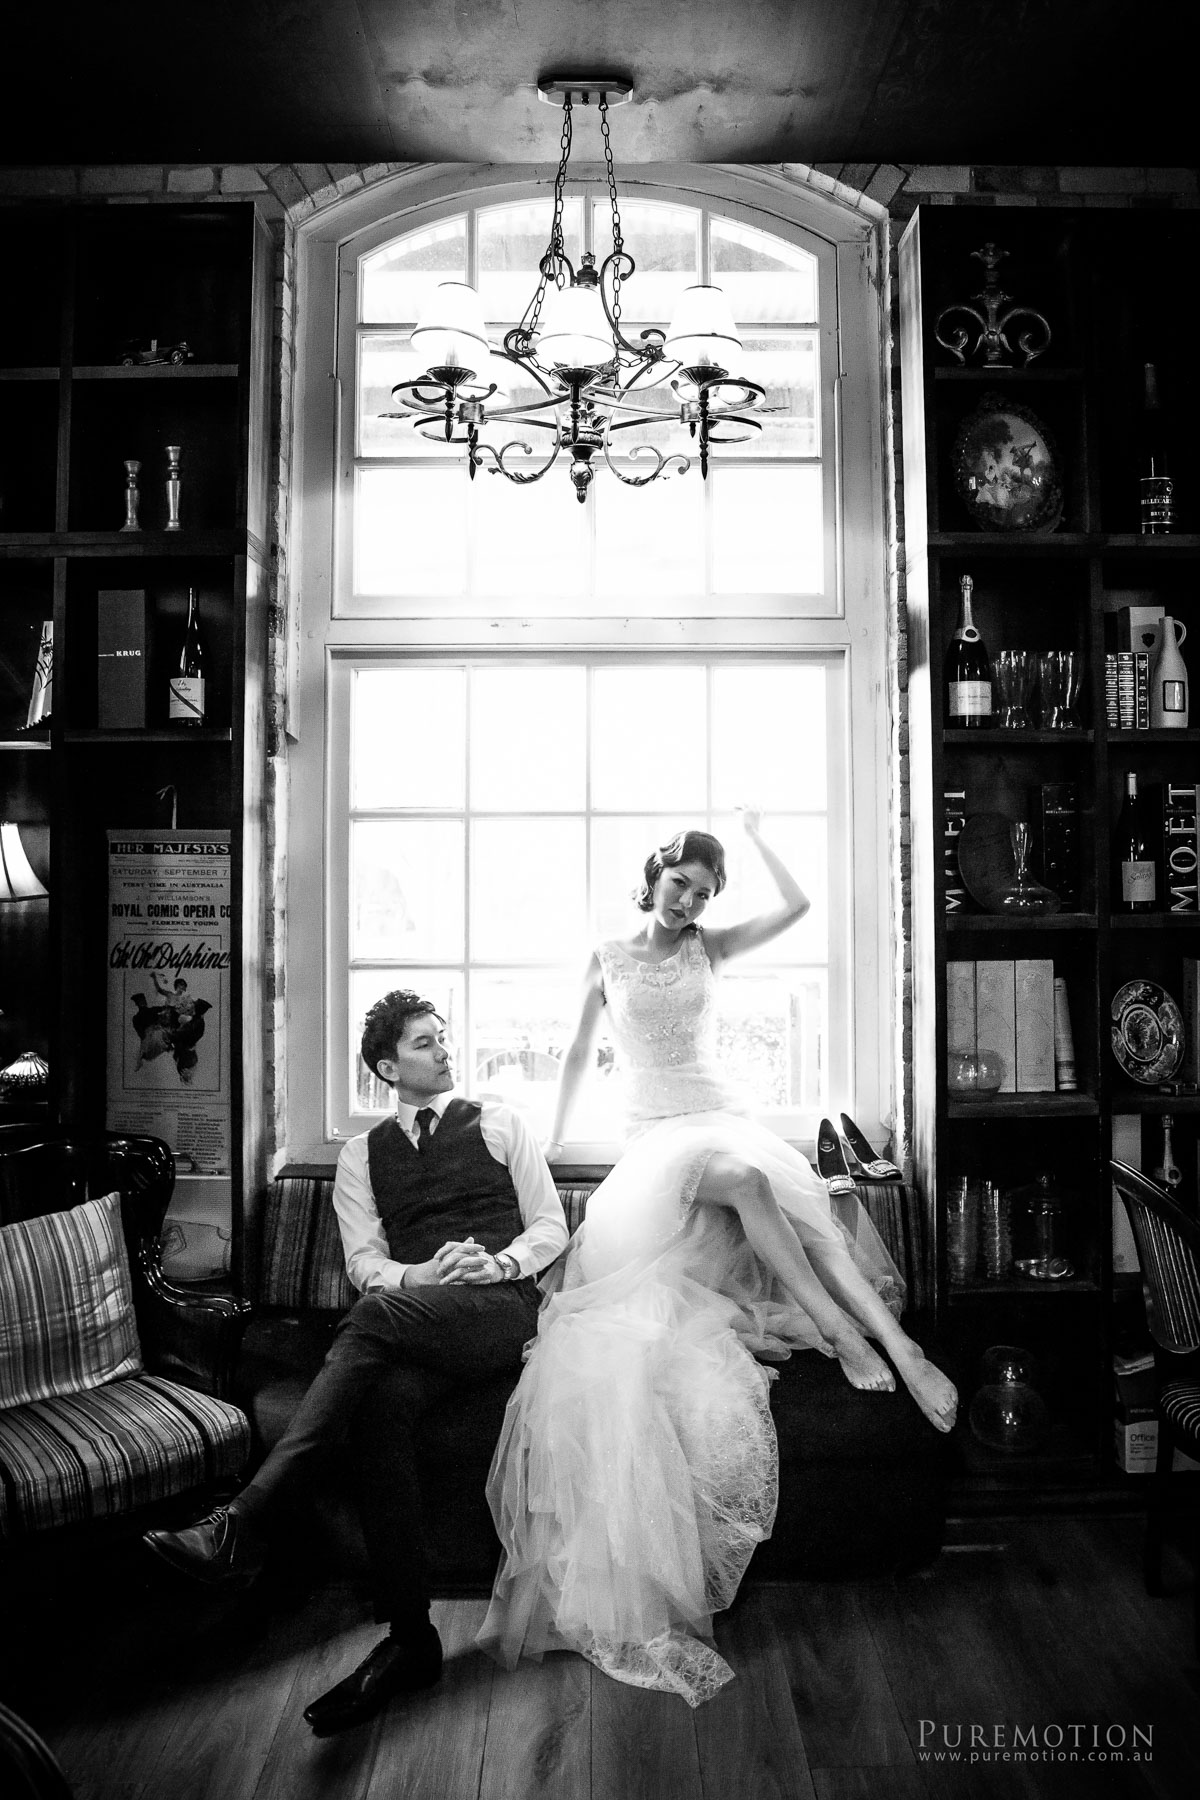 Brisbane-Wedding-Photographer-Puremotion-0090